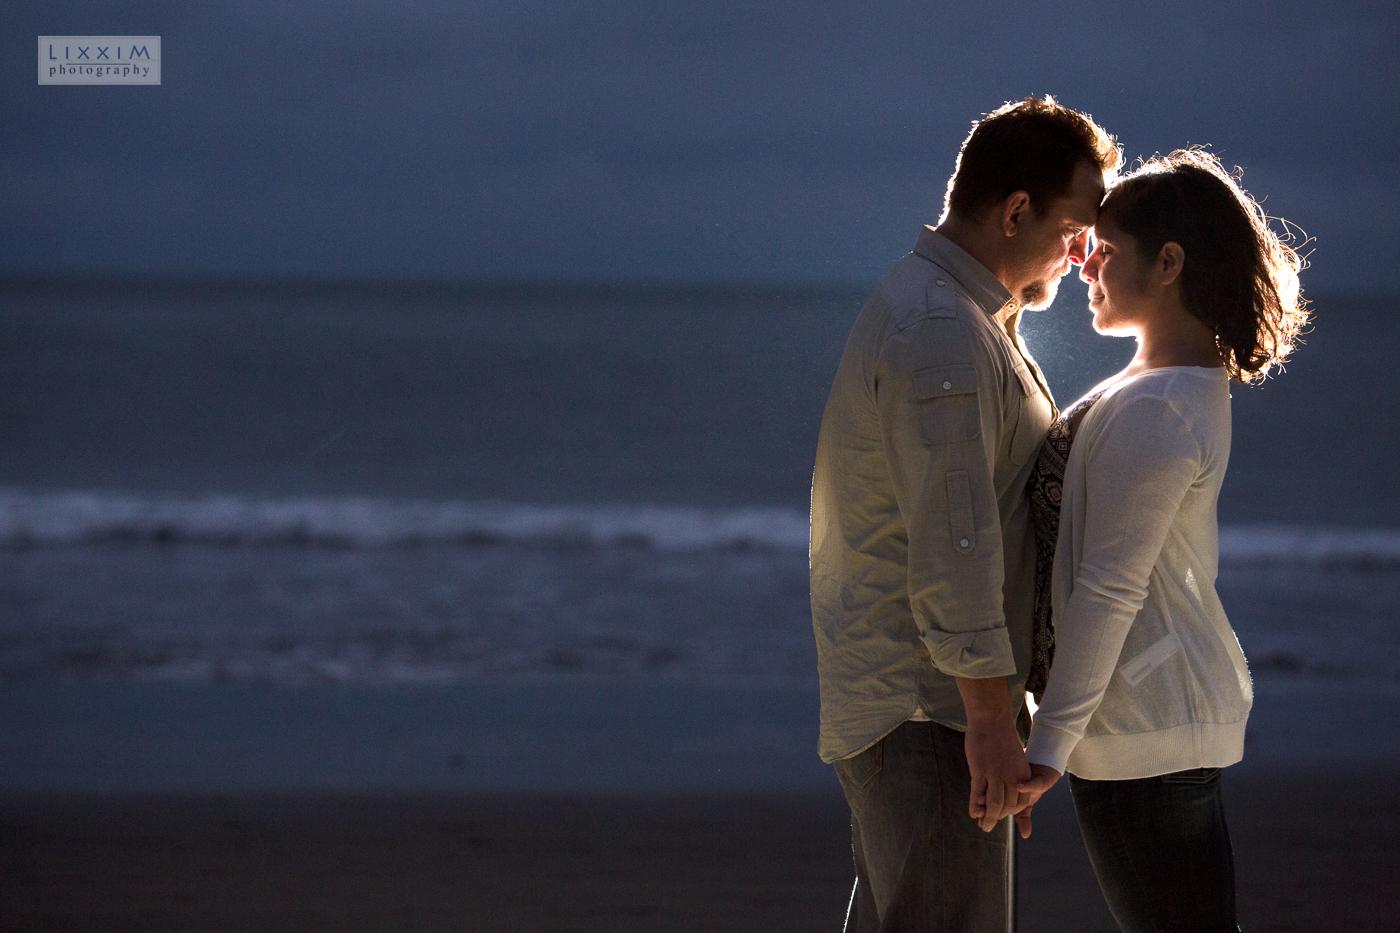 muir-beach-engagement-esession-photographer-photography-lixxim